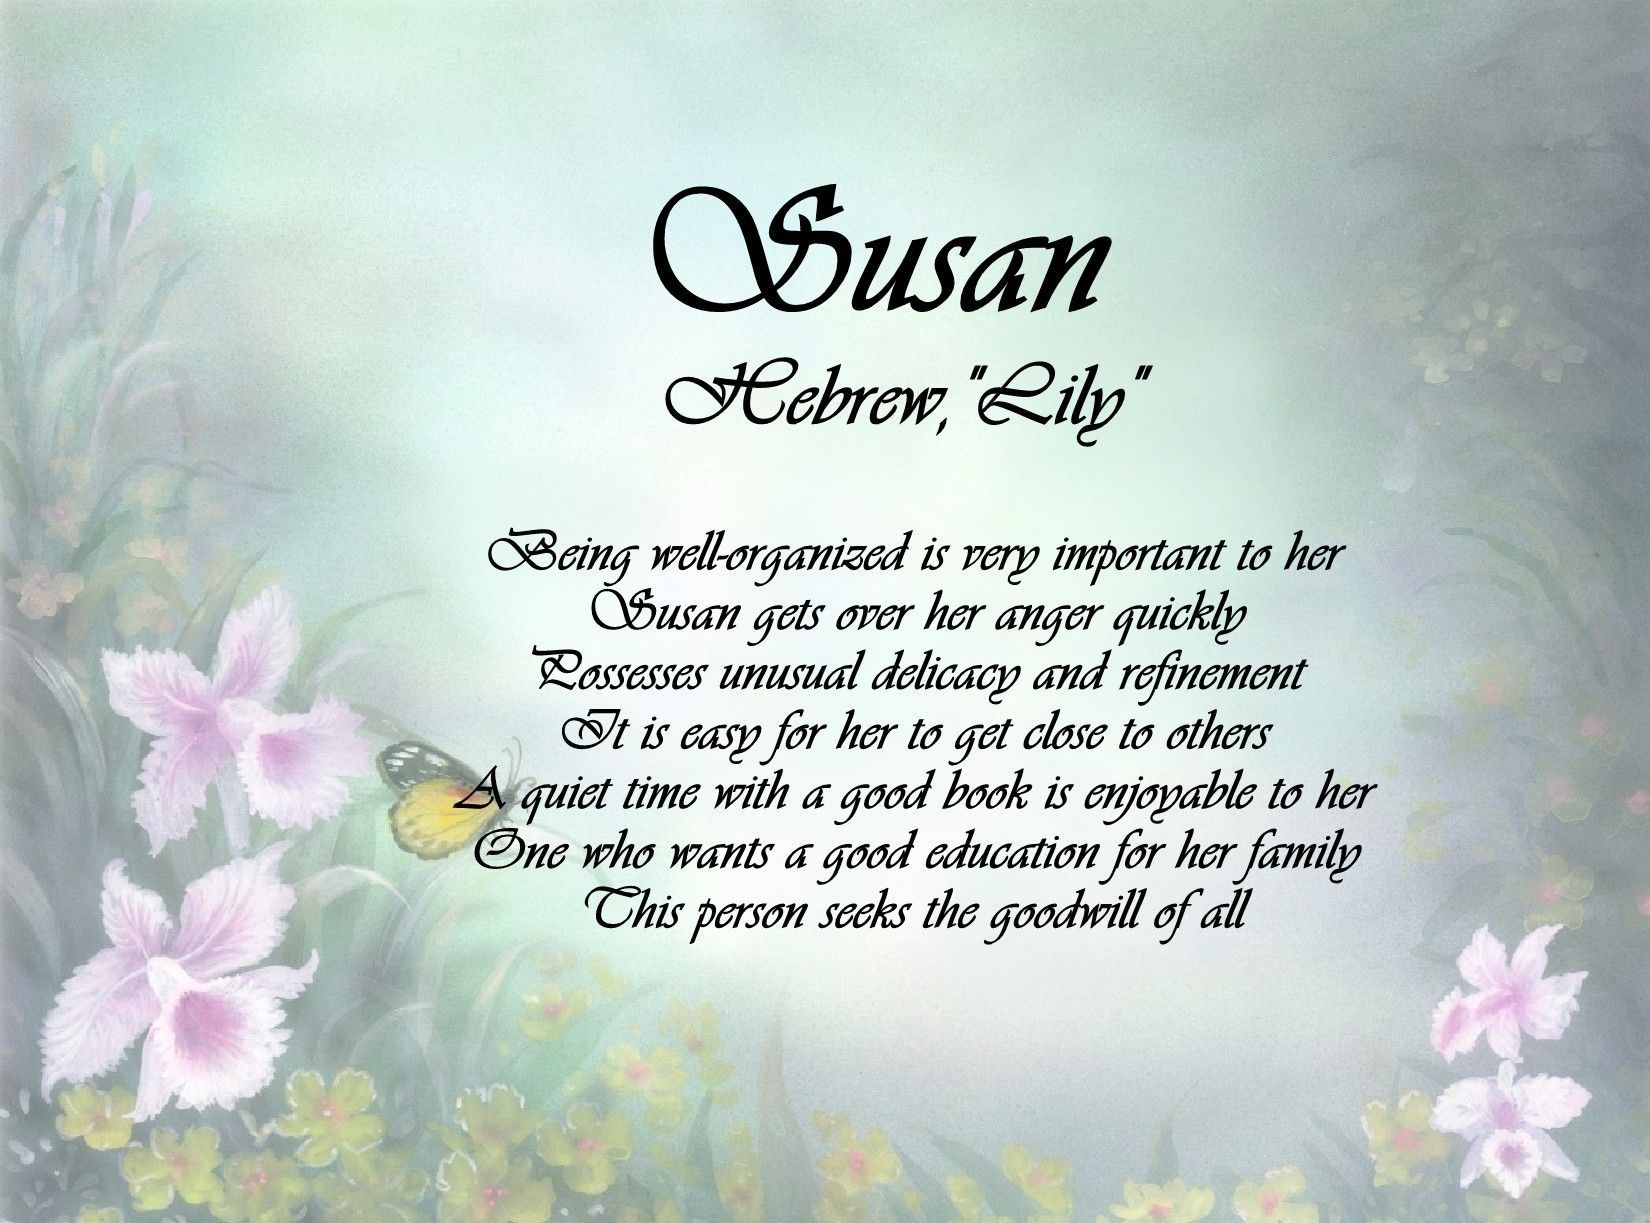 Susan Name Keepsake Print Getting over her, Scripture print